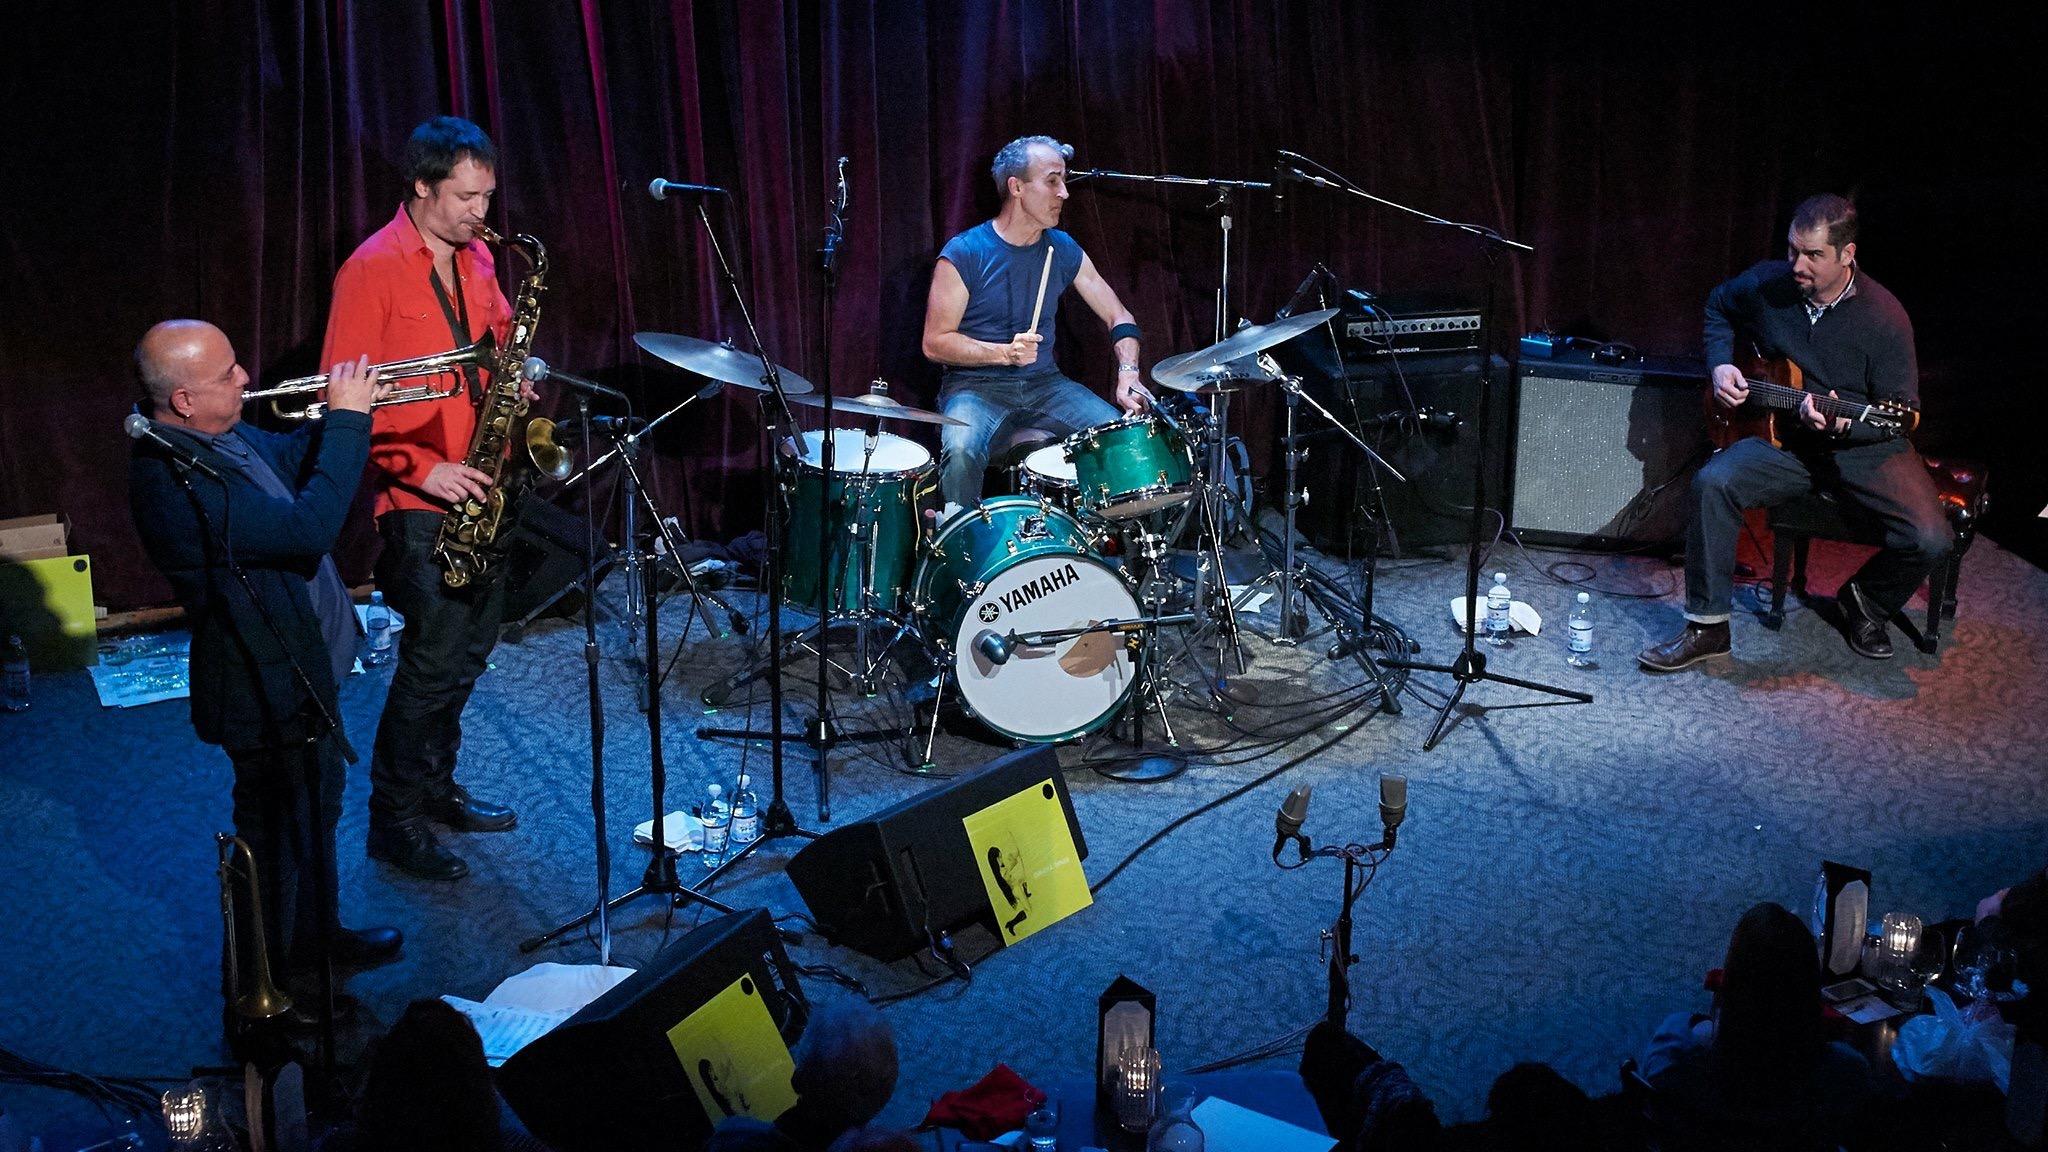 OMAHA DINER featuring Charlie Hunter-guitar/bass, Bobby Previte-drums, Steven Bernstein-trumpet, slide trumpet, Skerik-sax